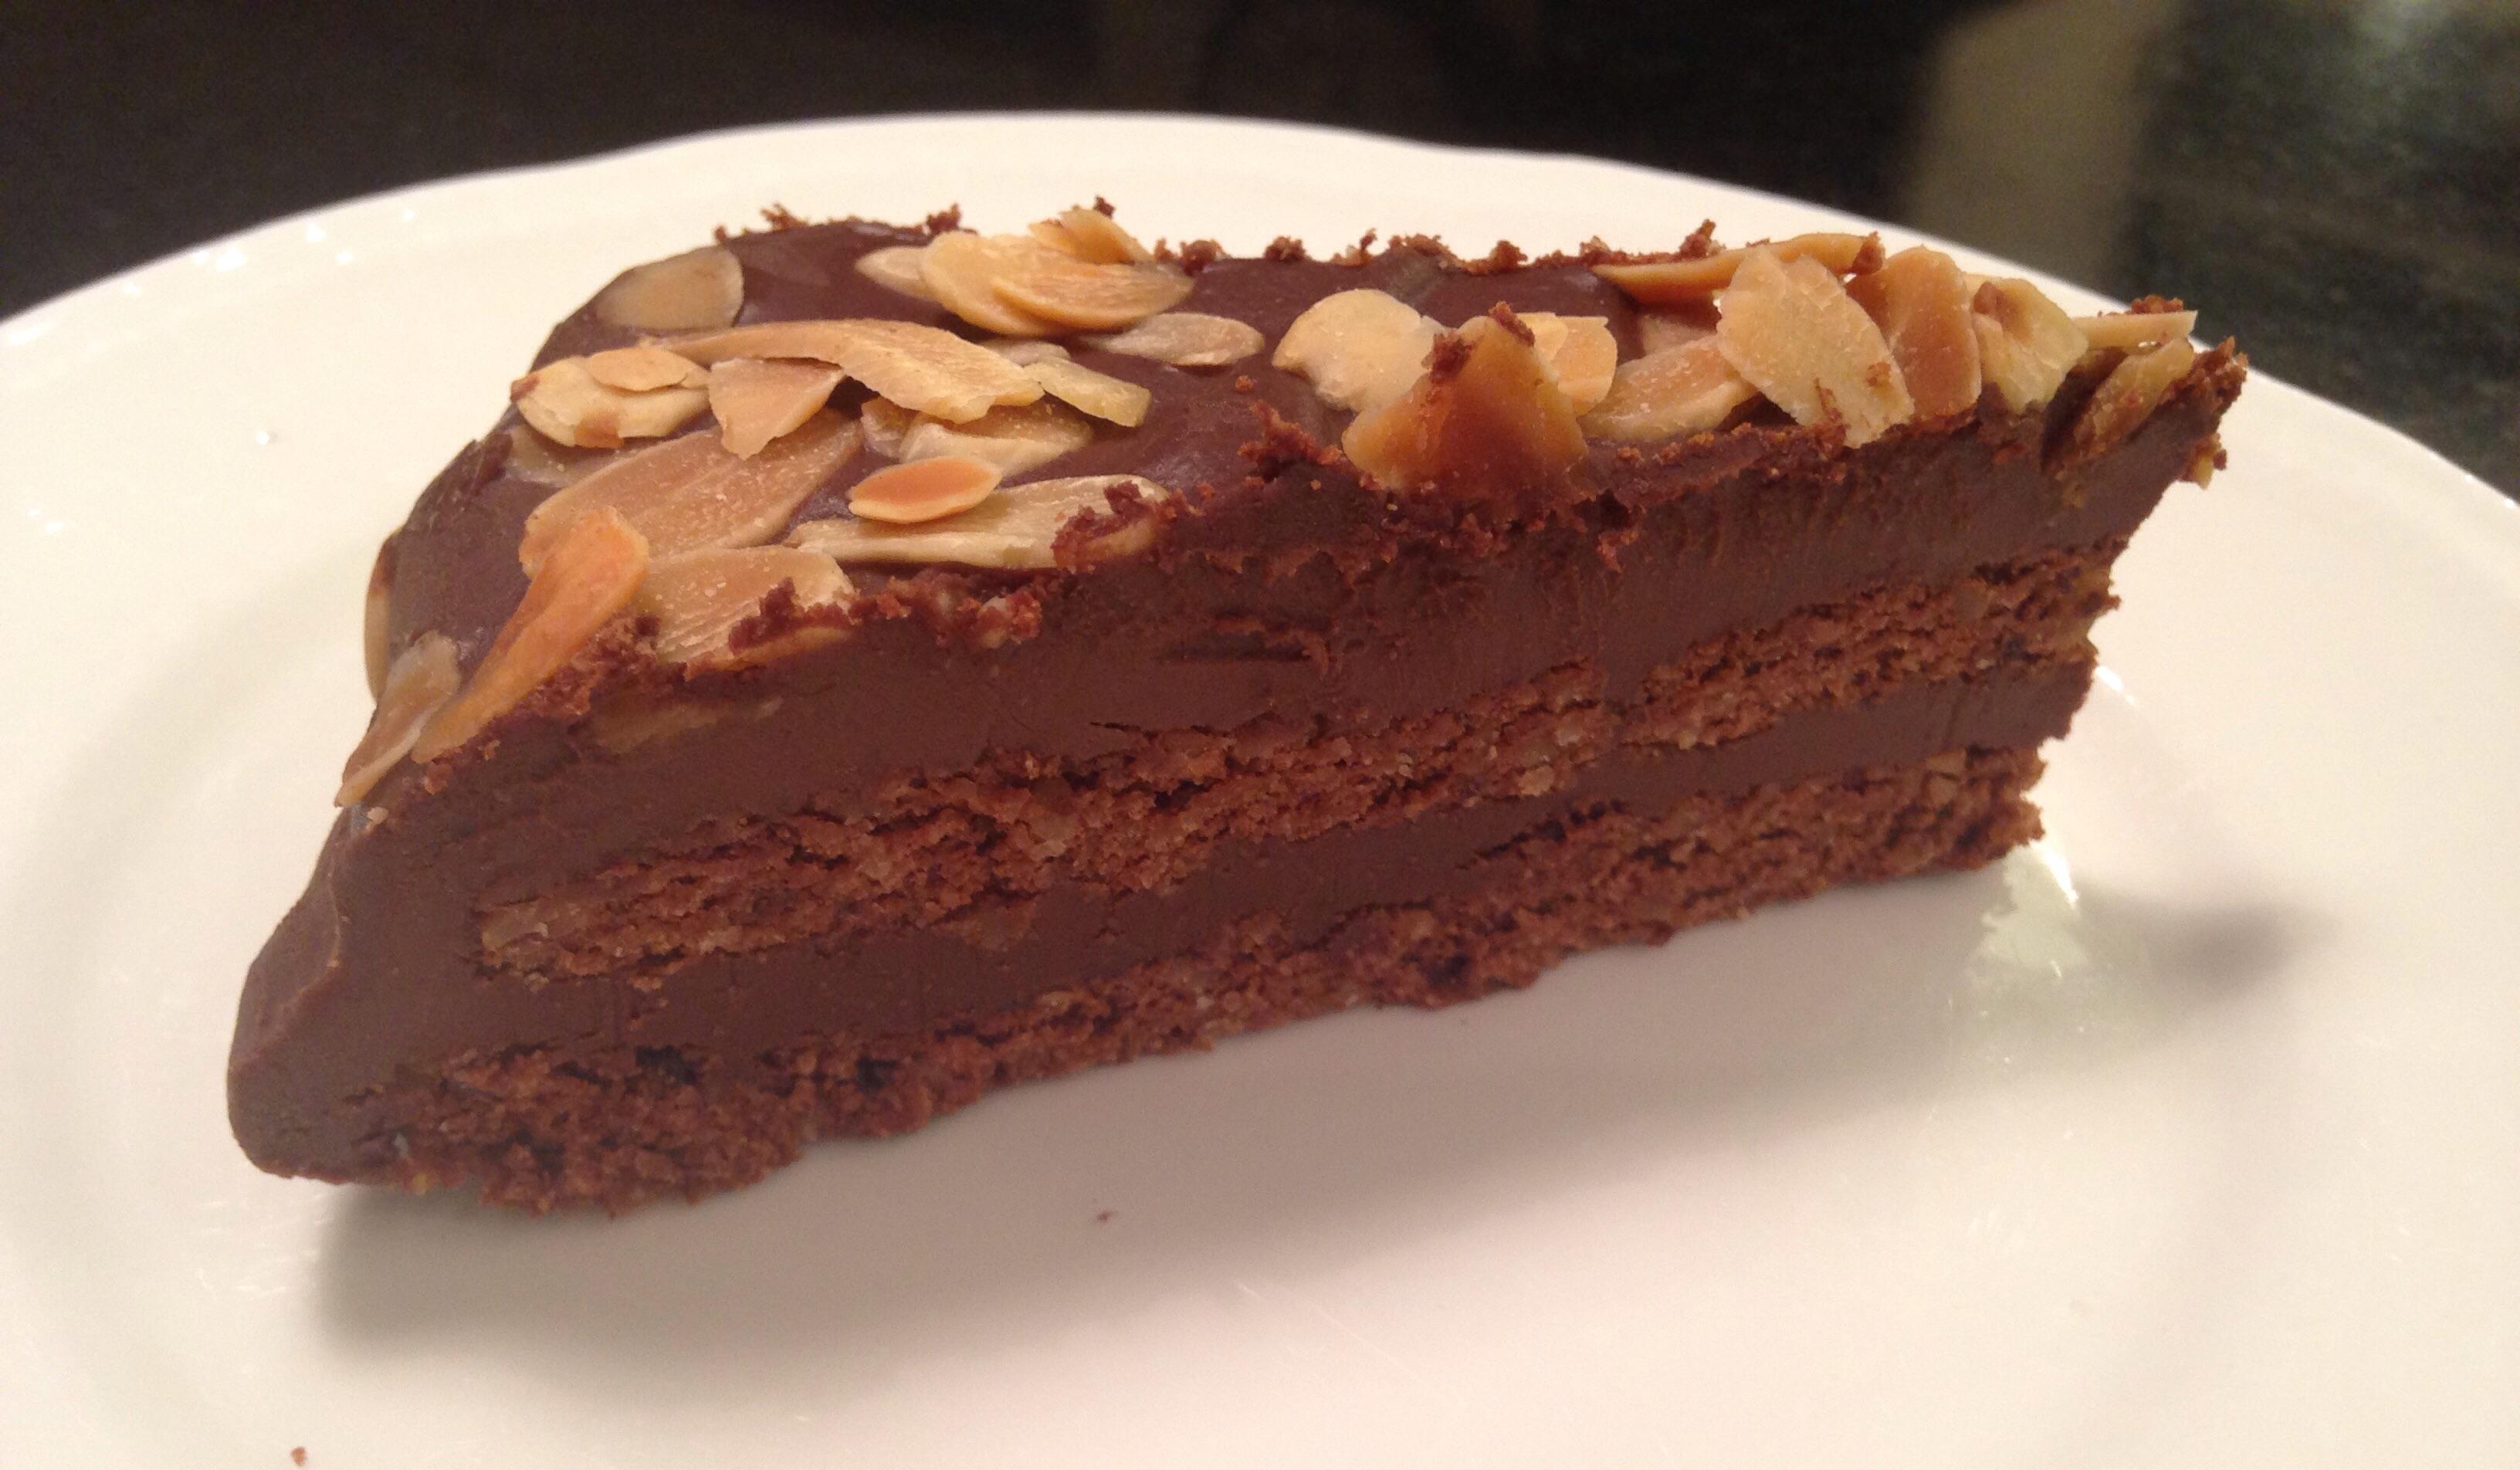 Fantastiskt god LCHF Chokladmandeltårta